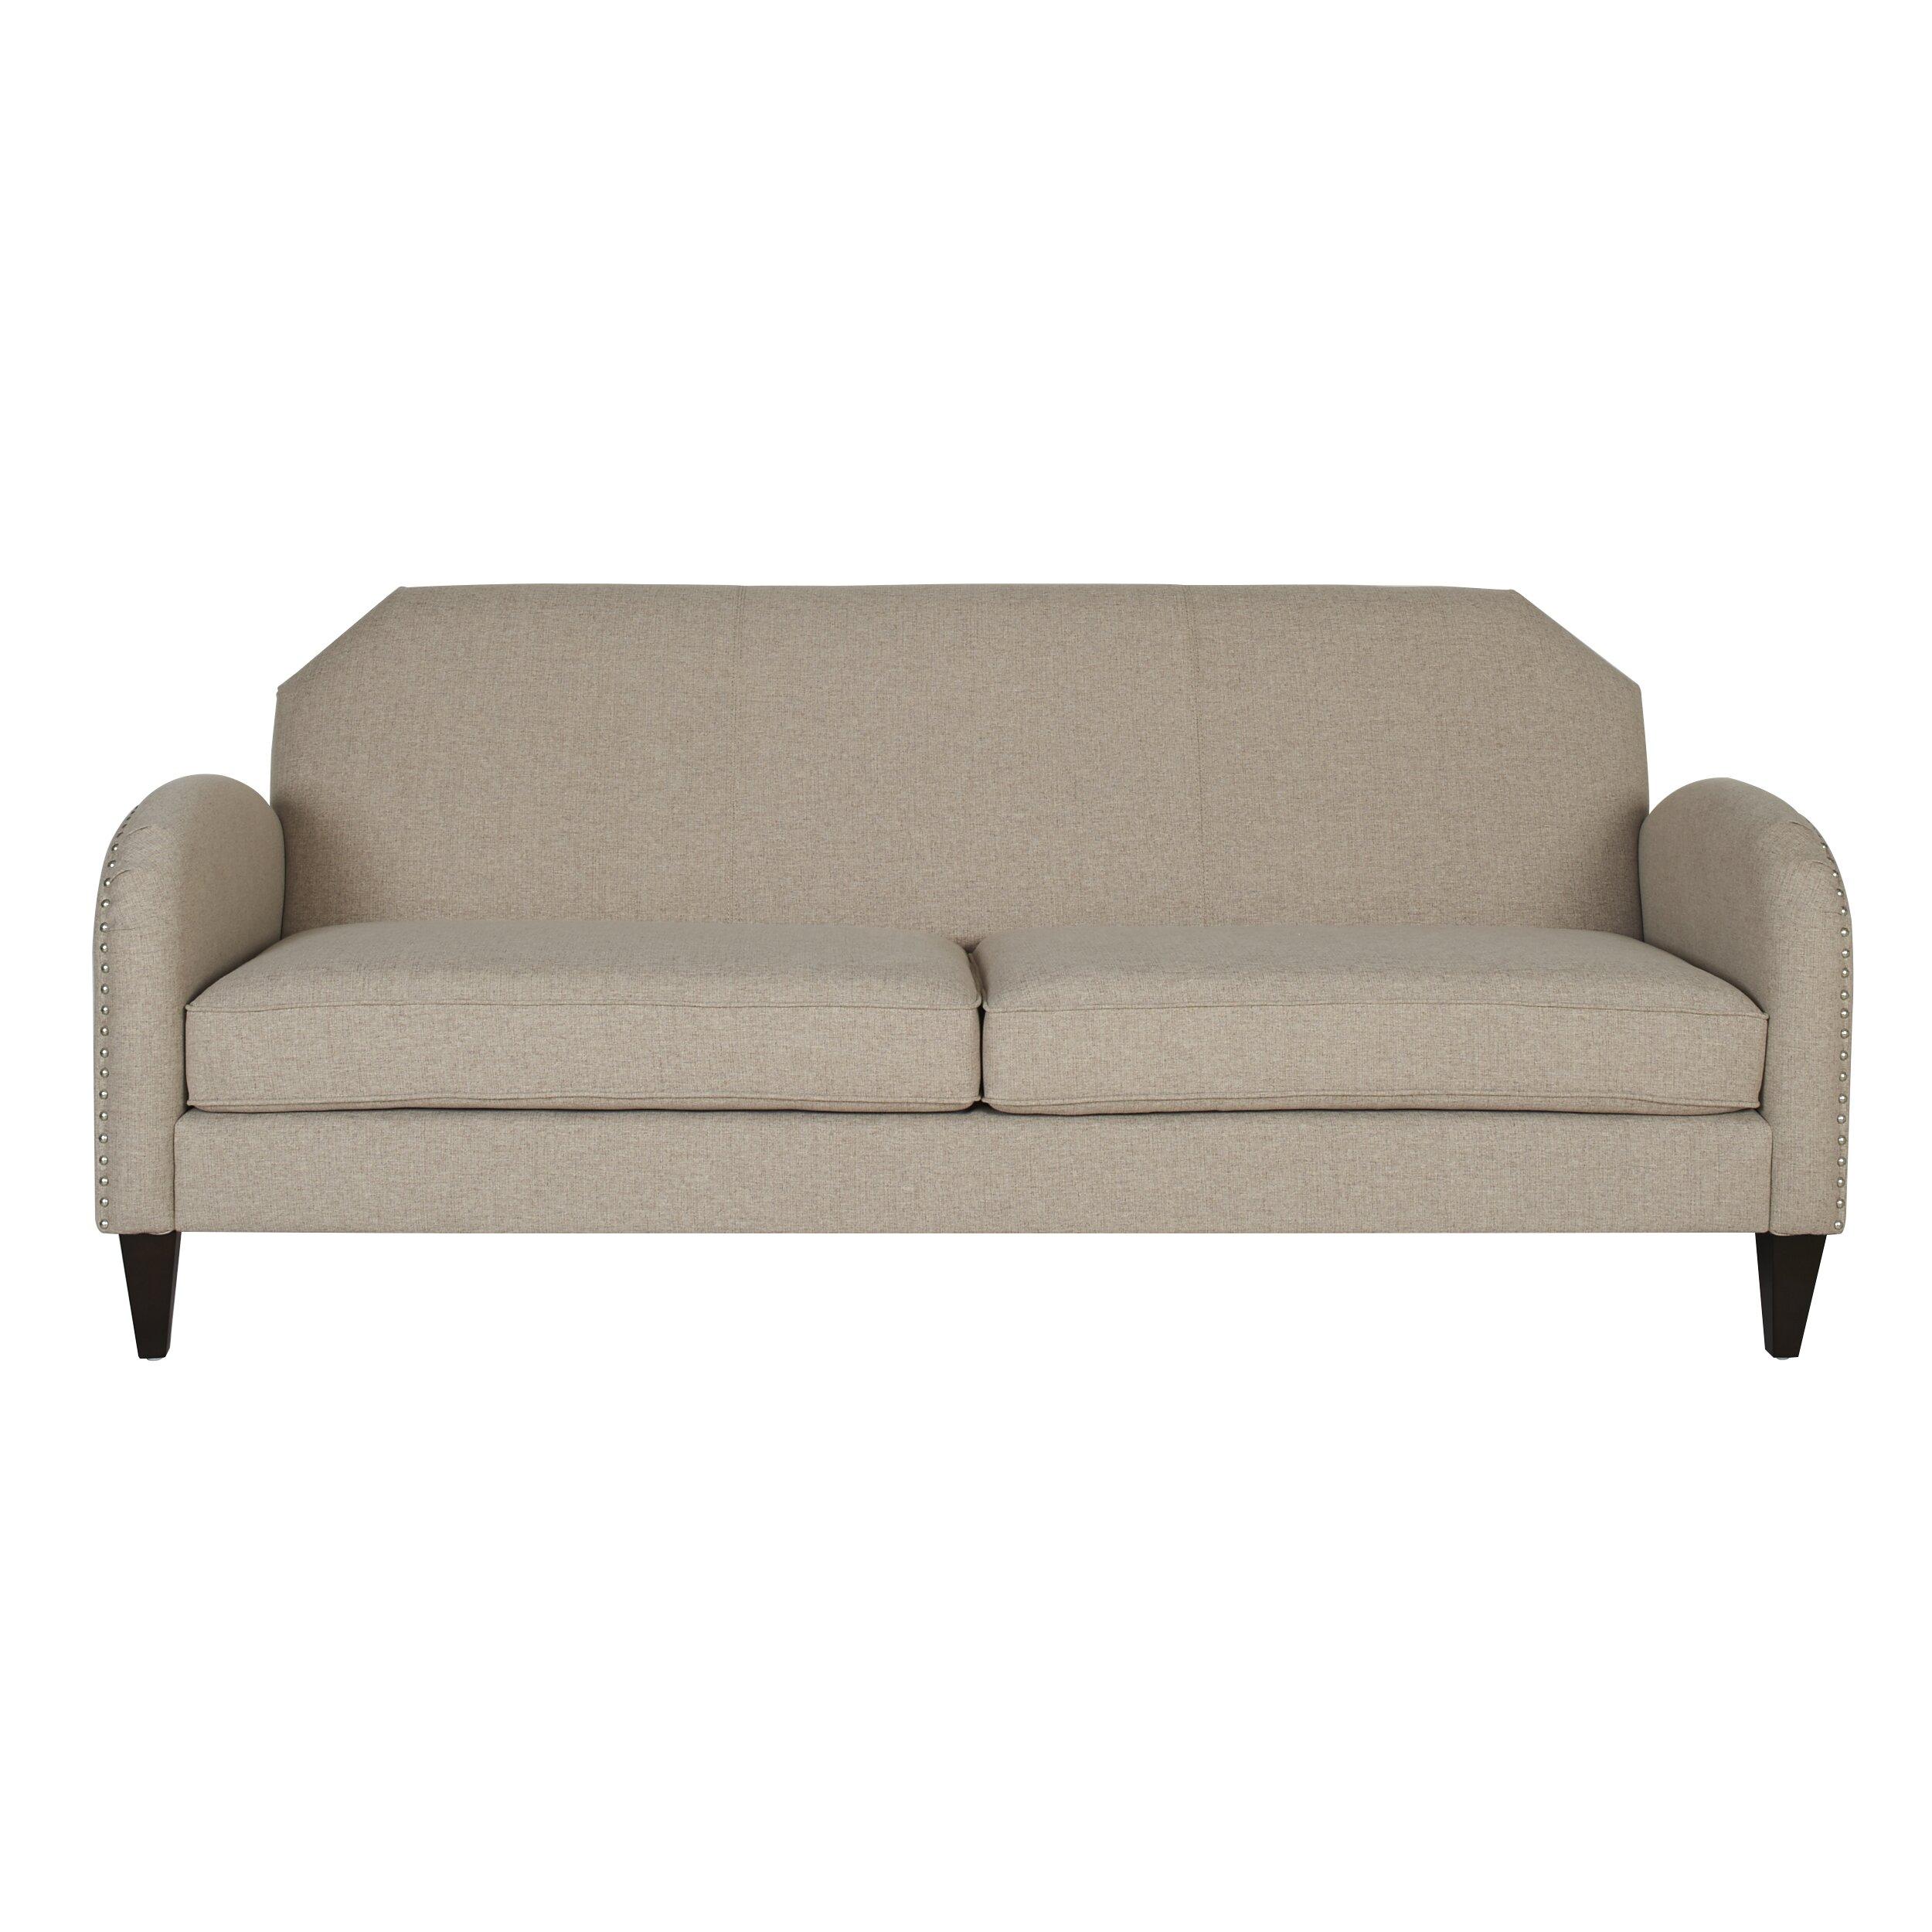 darby home co ella unique curved arm sofa wayfair. Black Bedroom Furniture Sets. Home Design Ideas